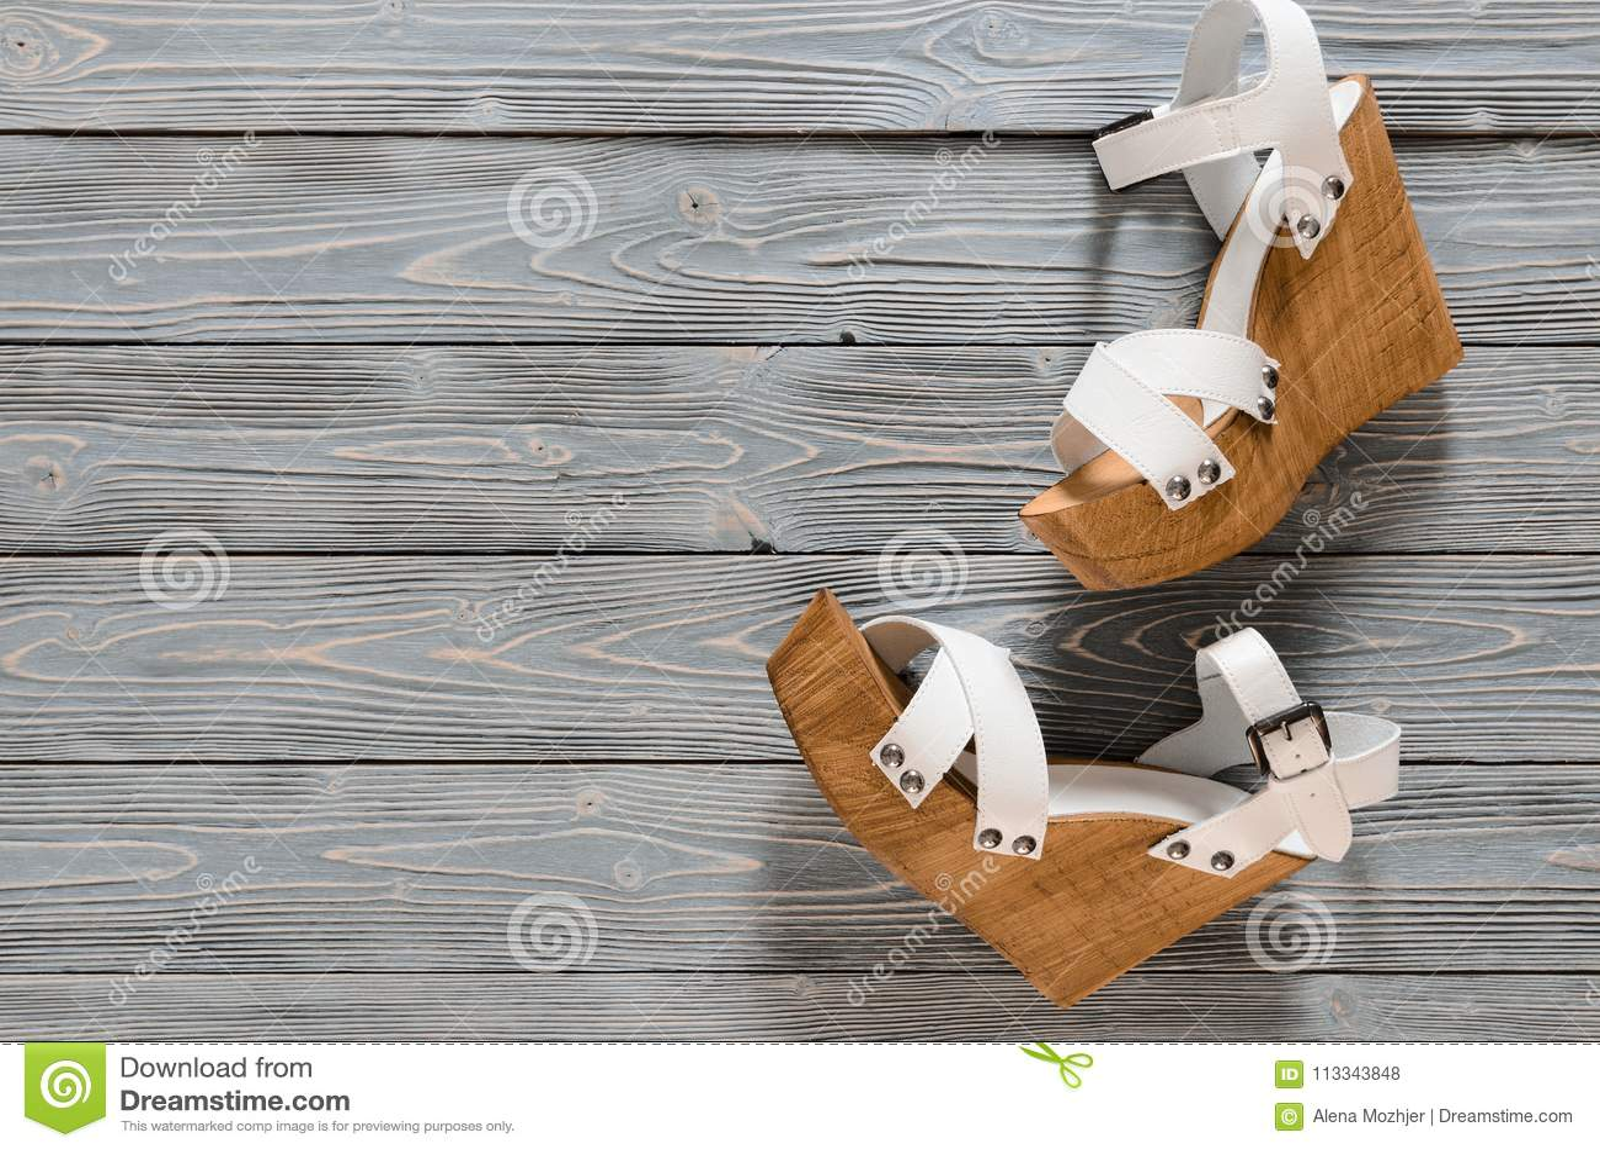 6c9eddae4e Womens Shoes Crisscross Wood Platform Wedges On Grey Wooden Ba Stock ...